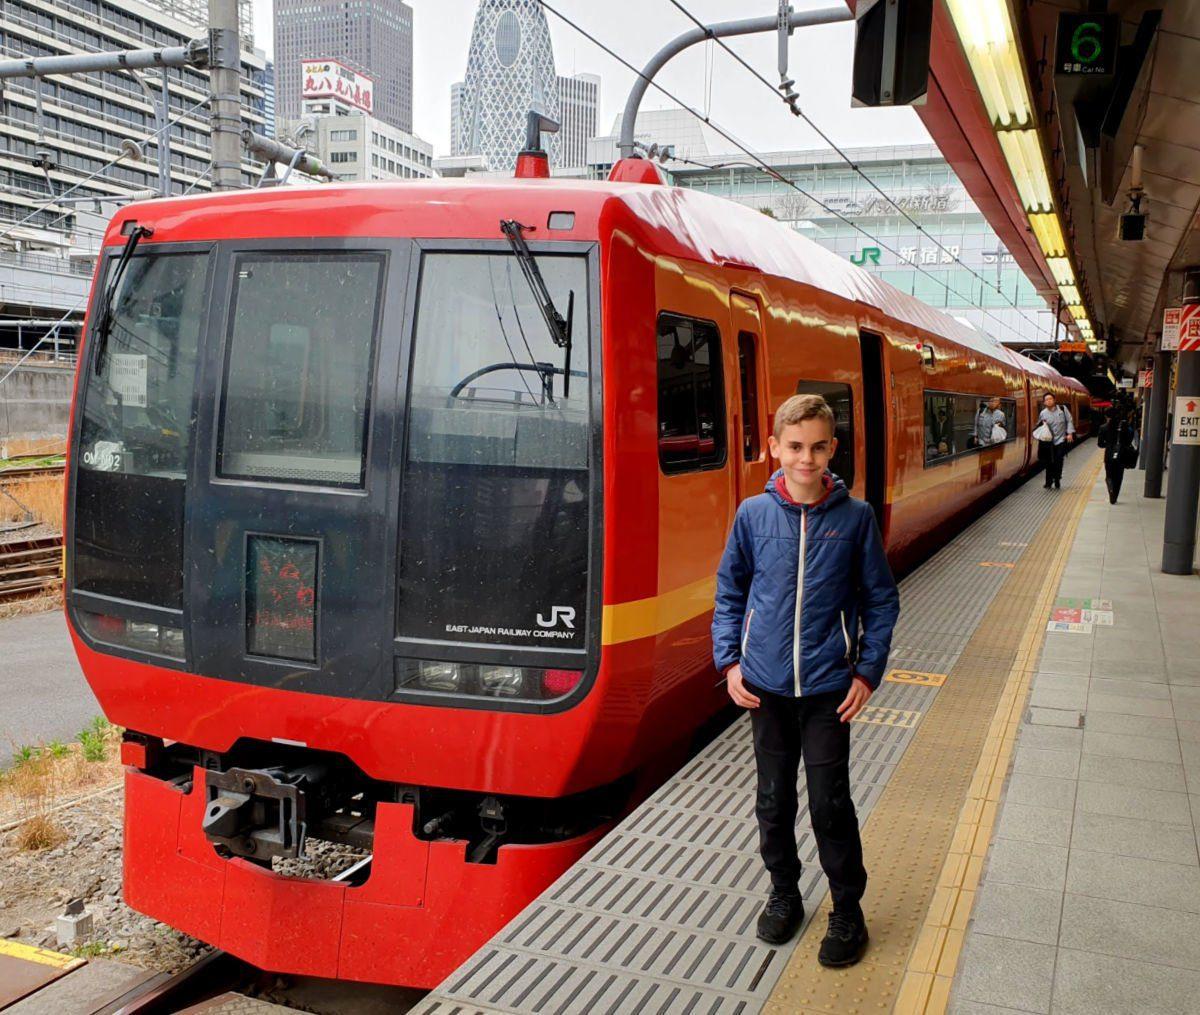 JR Train from Shinjuku Station to Kinugawa Onsen